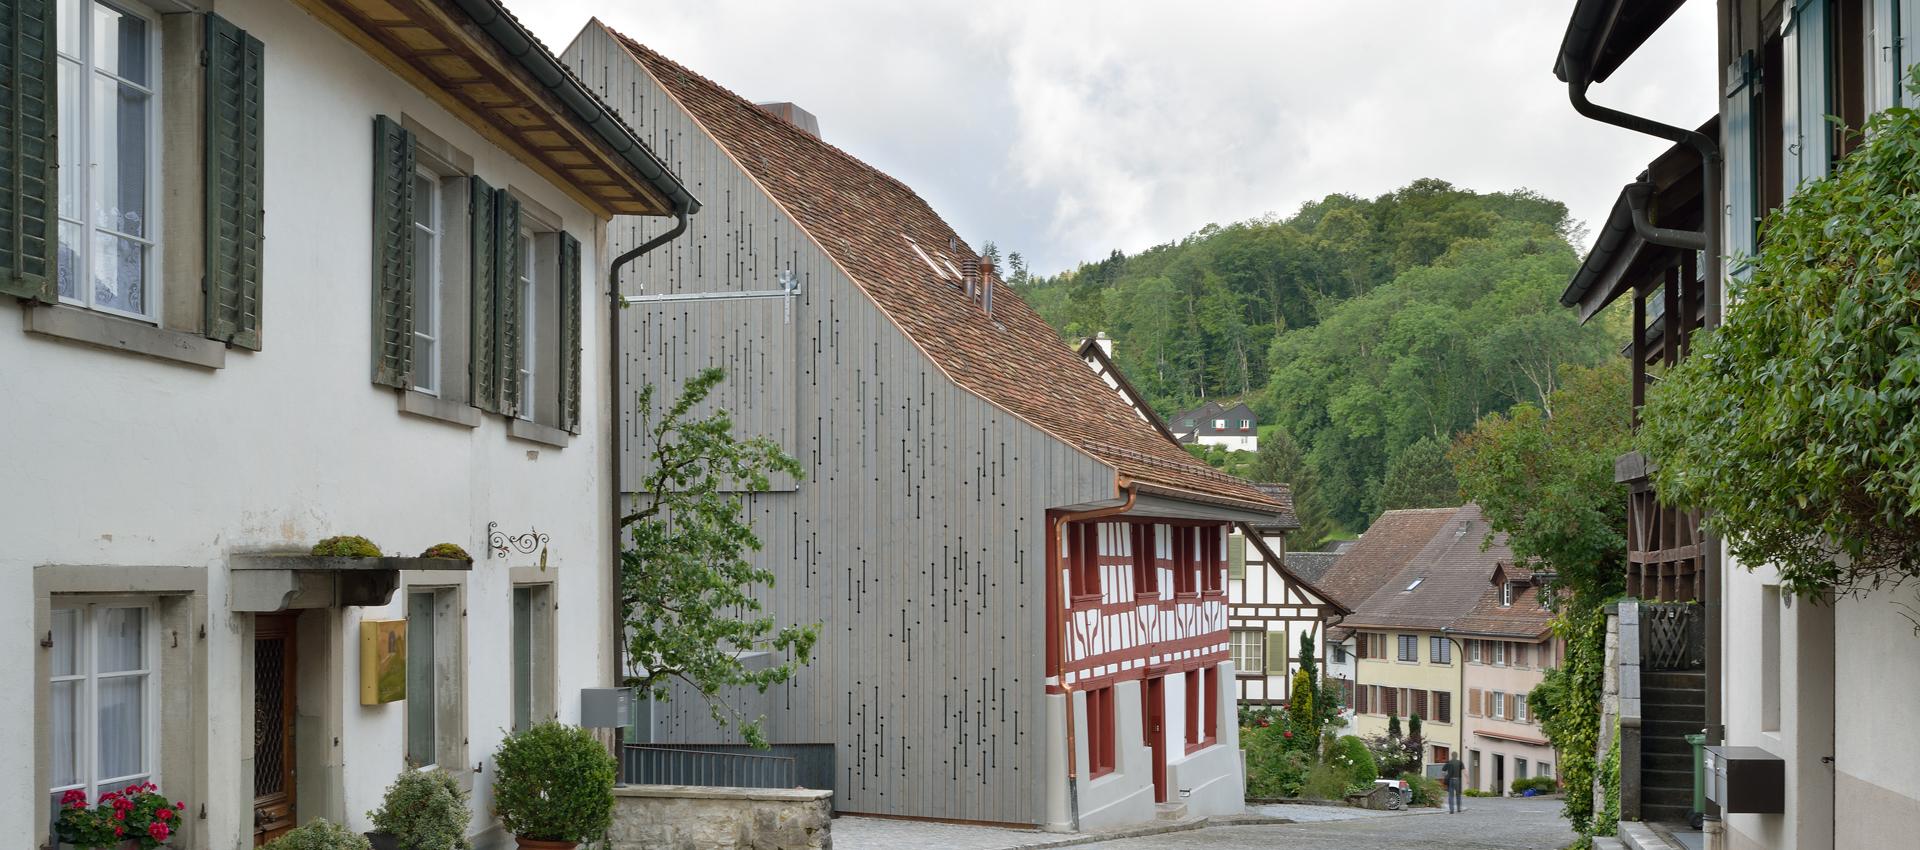 Rehabilitaci n de la casa lendenmann por l3p architekten metalocus - Rehabilitacion de casas ...